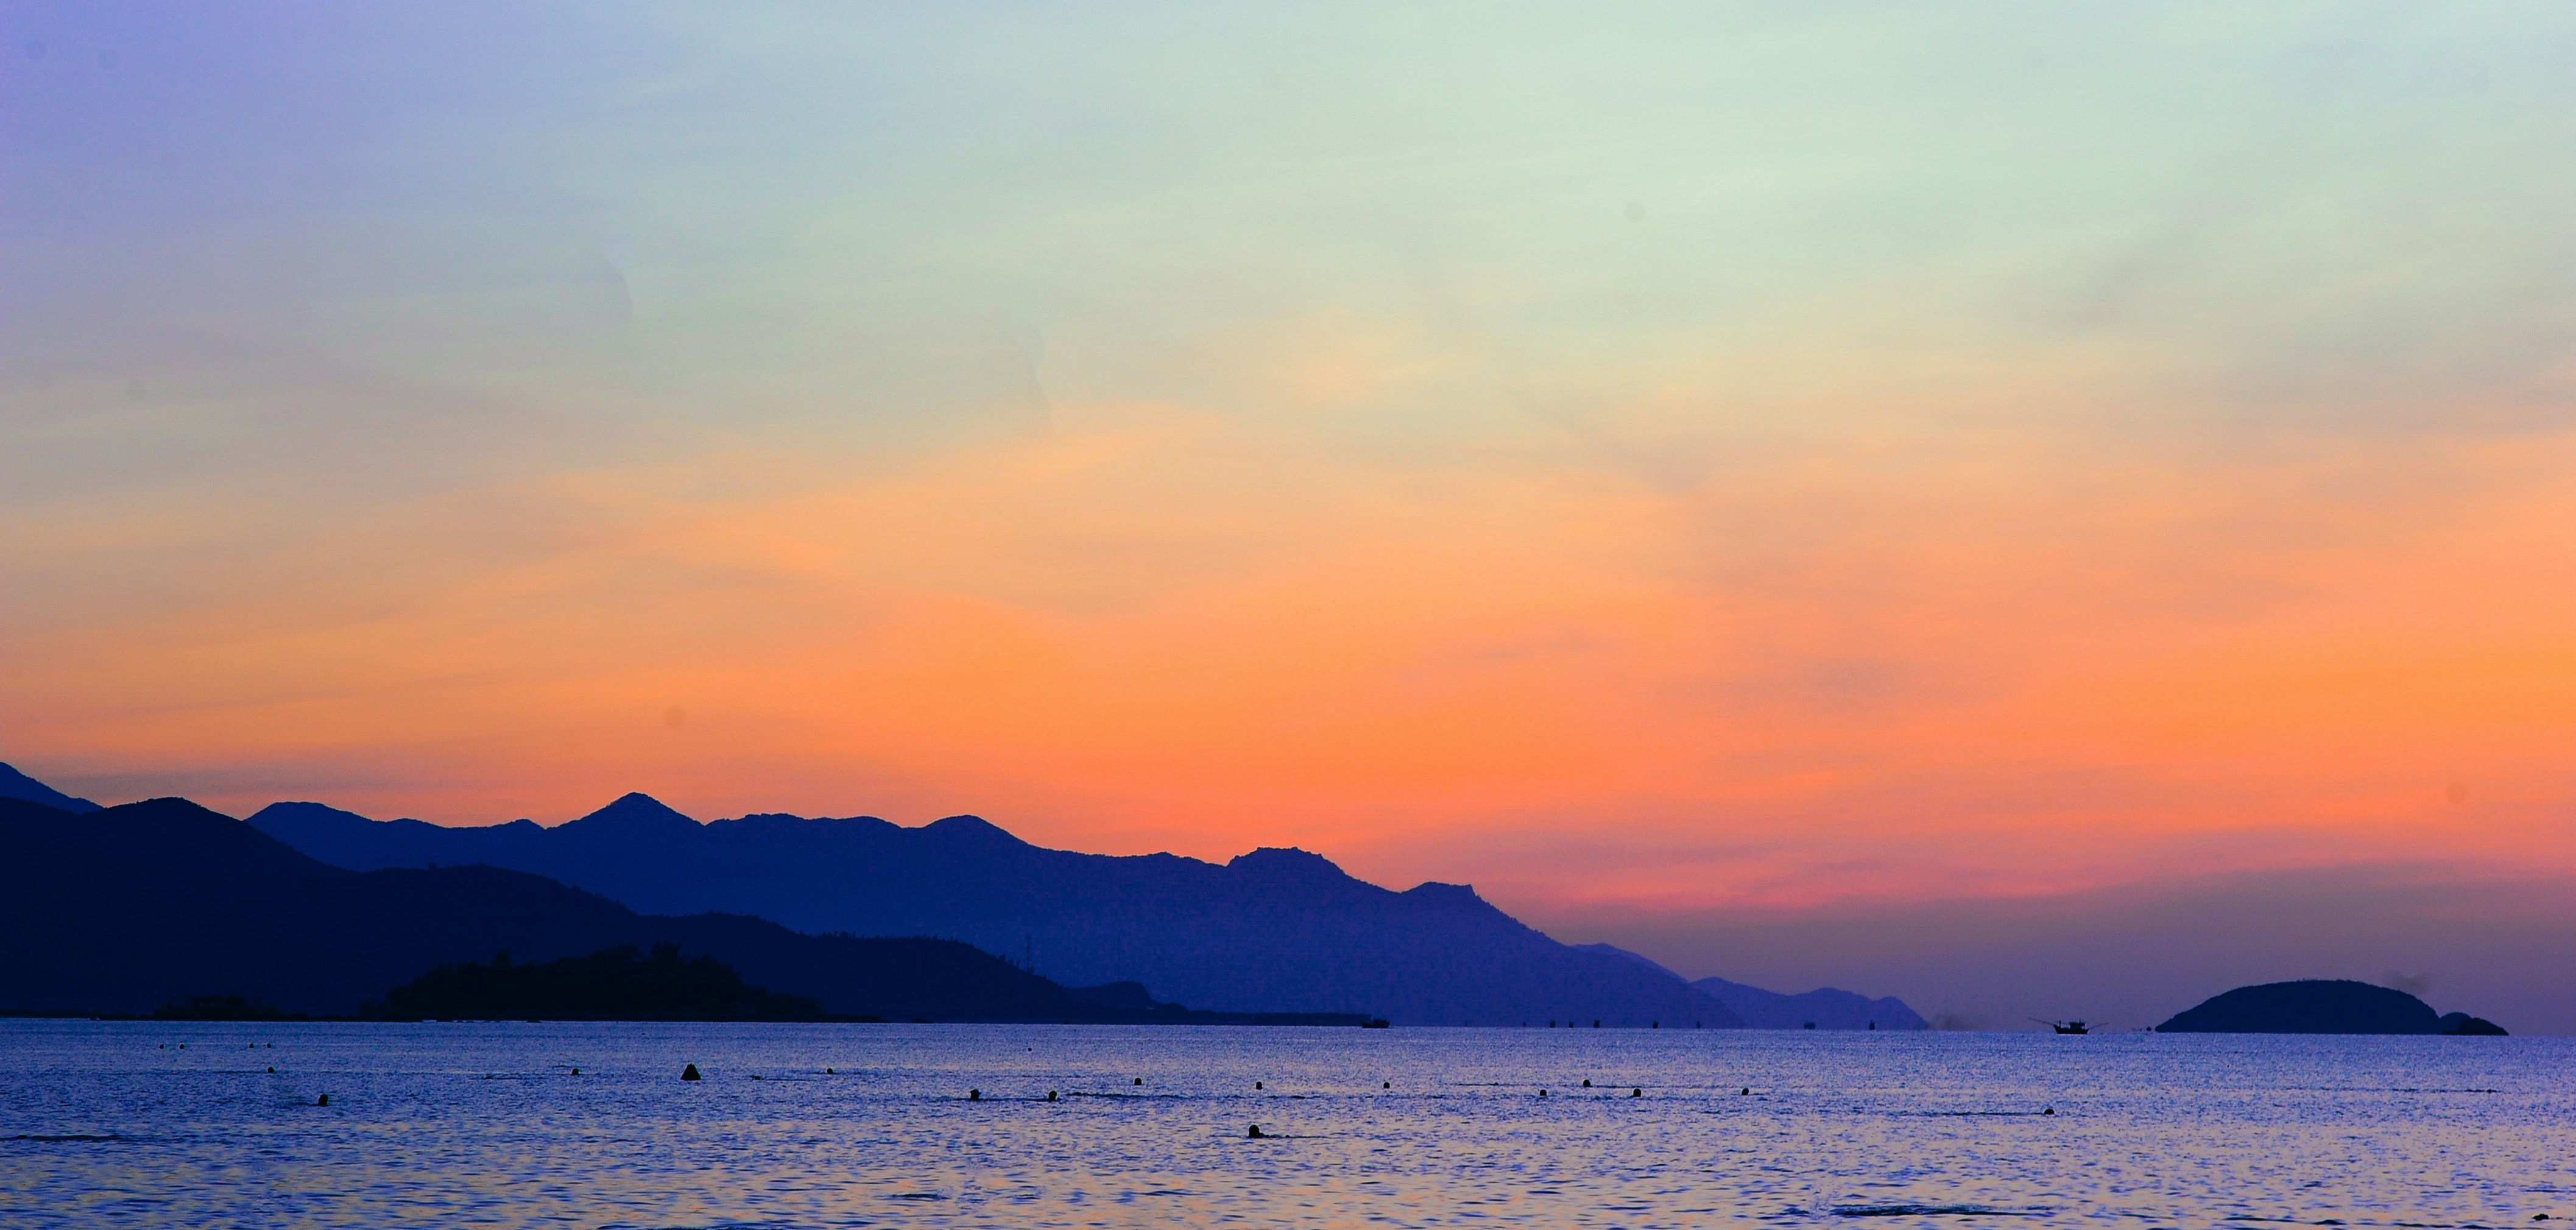 Striking Sunset Above The Sea Stock Photo - Image of